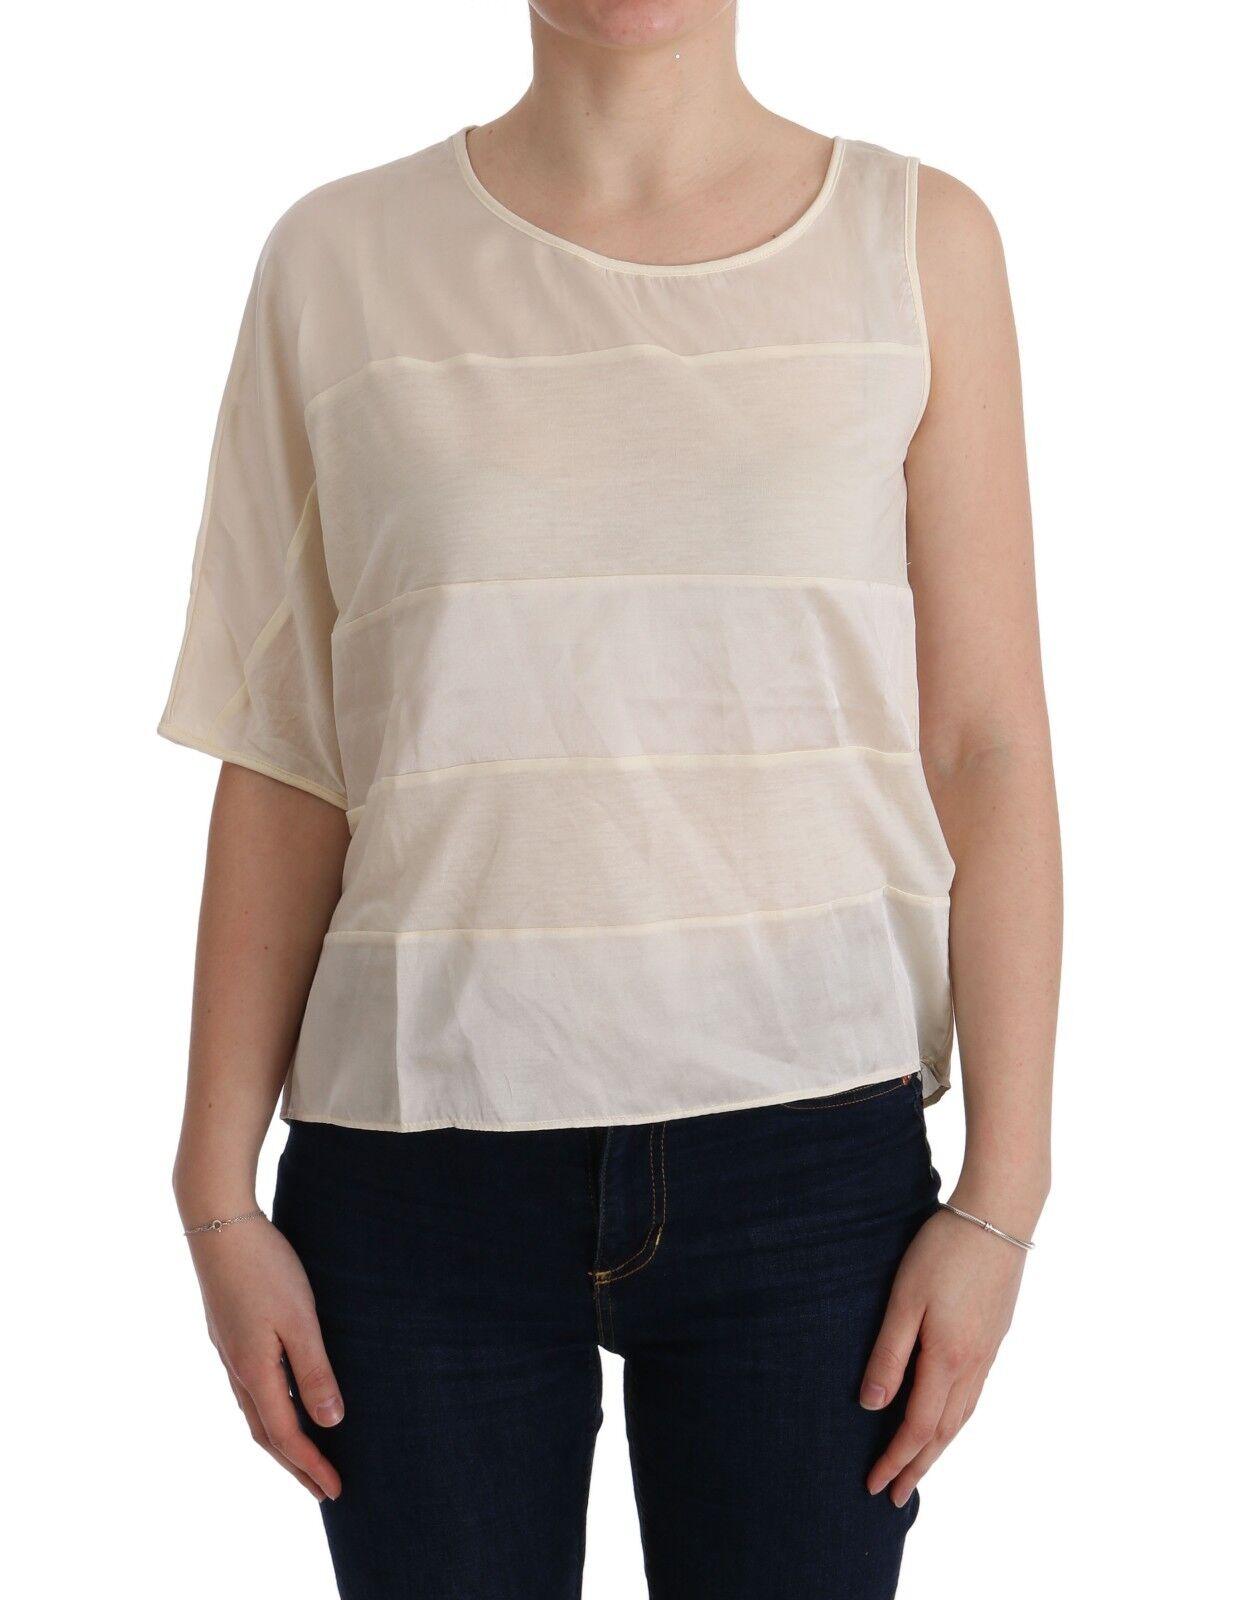 NUOVO C E C CoSTUME NATIONAL Beige asimmetrico t-shirt top camicetta S.2XS   us0